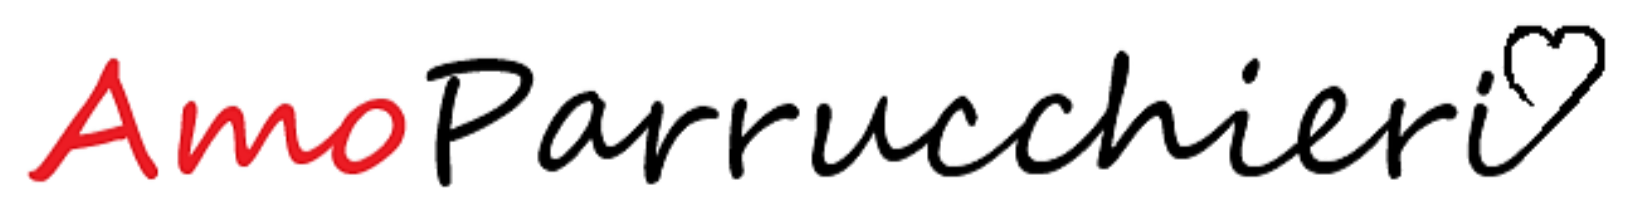 Amo Parrucchieri | Spinaceto